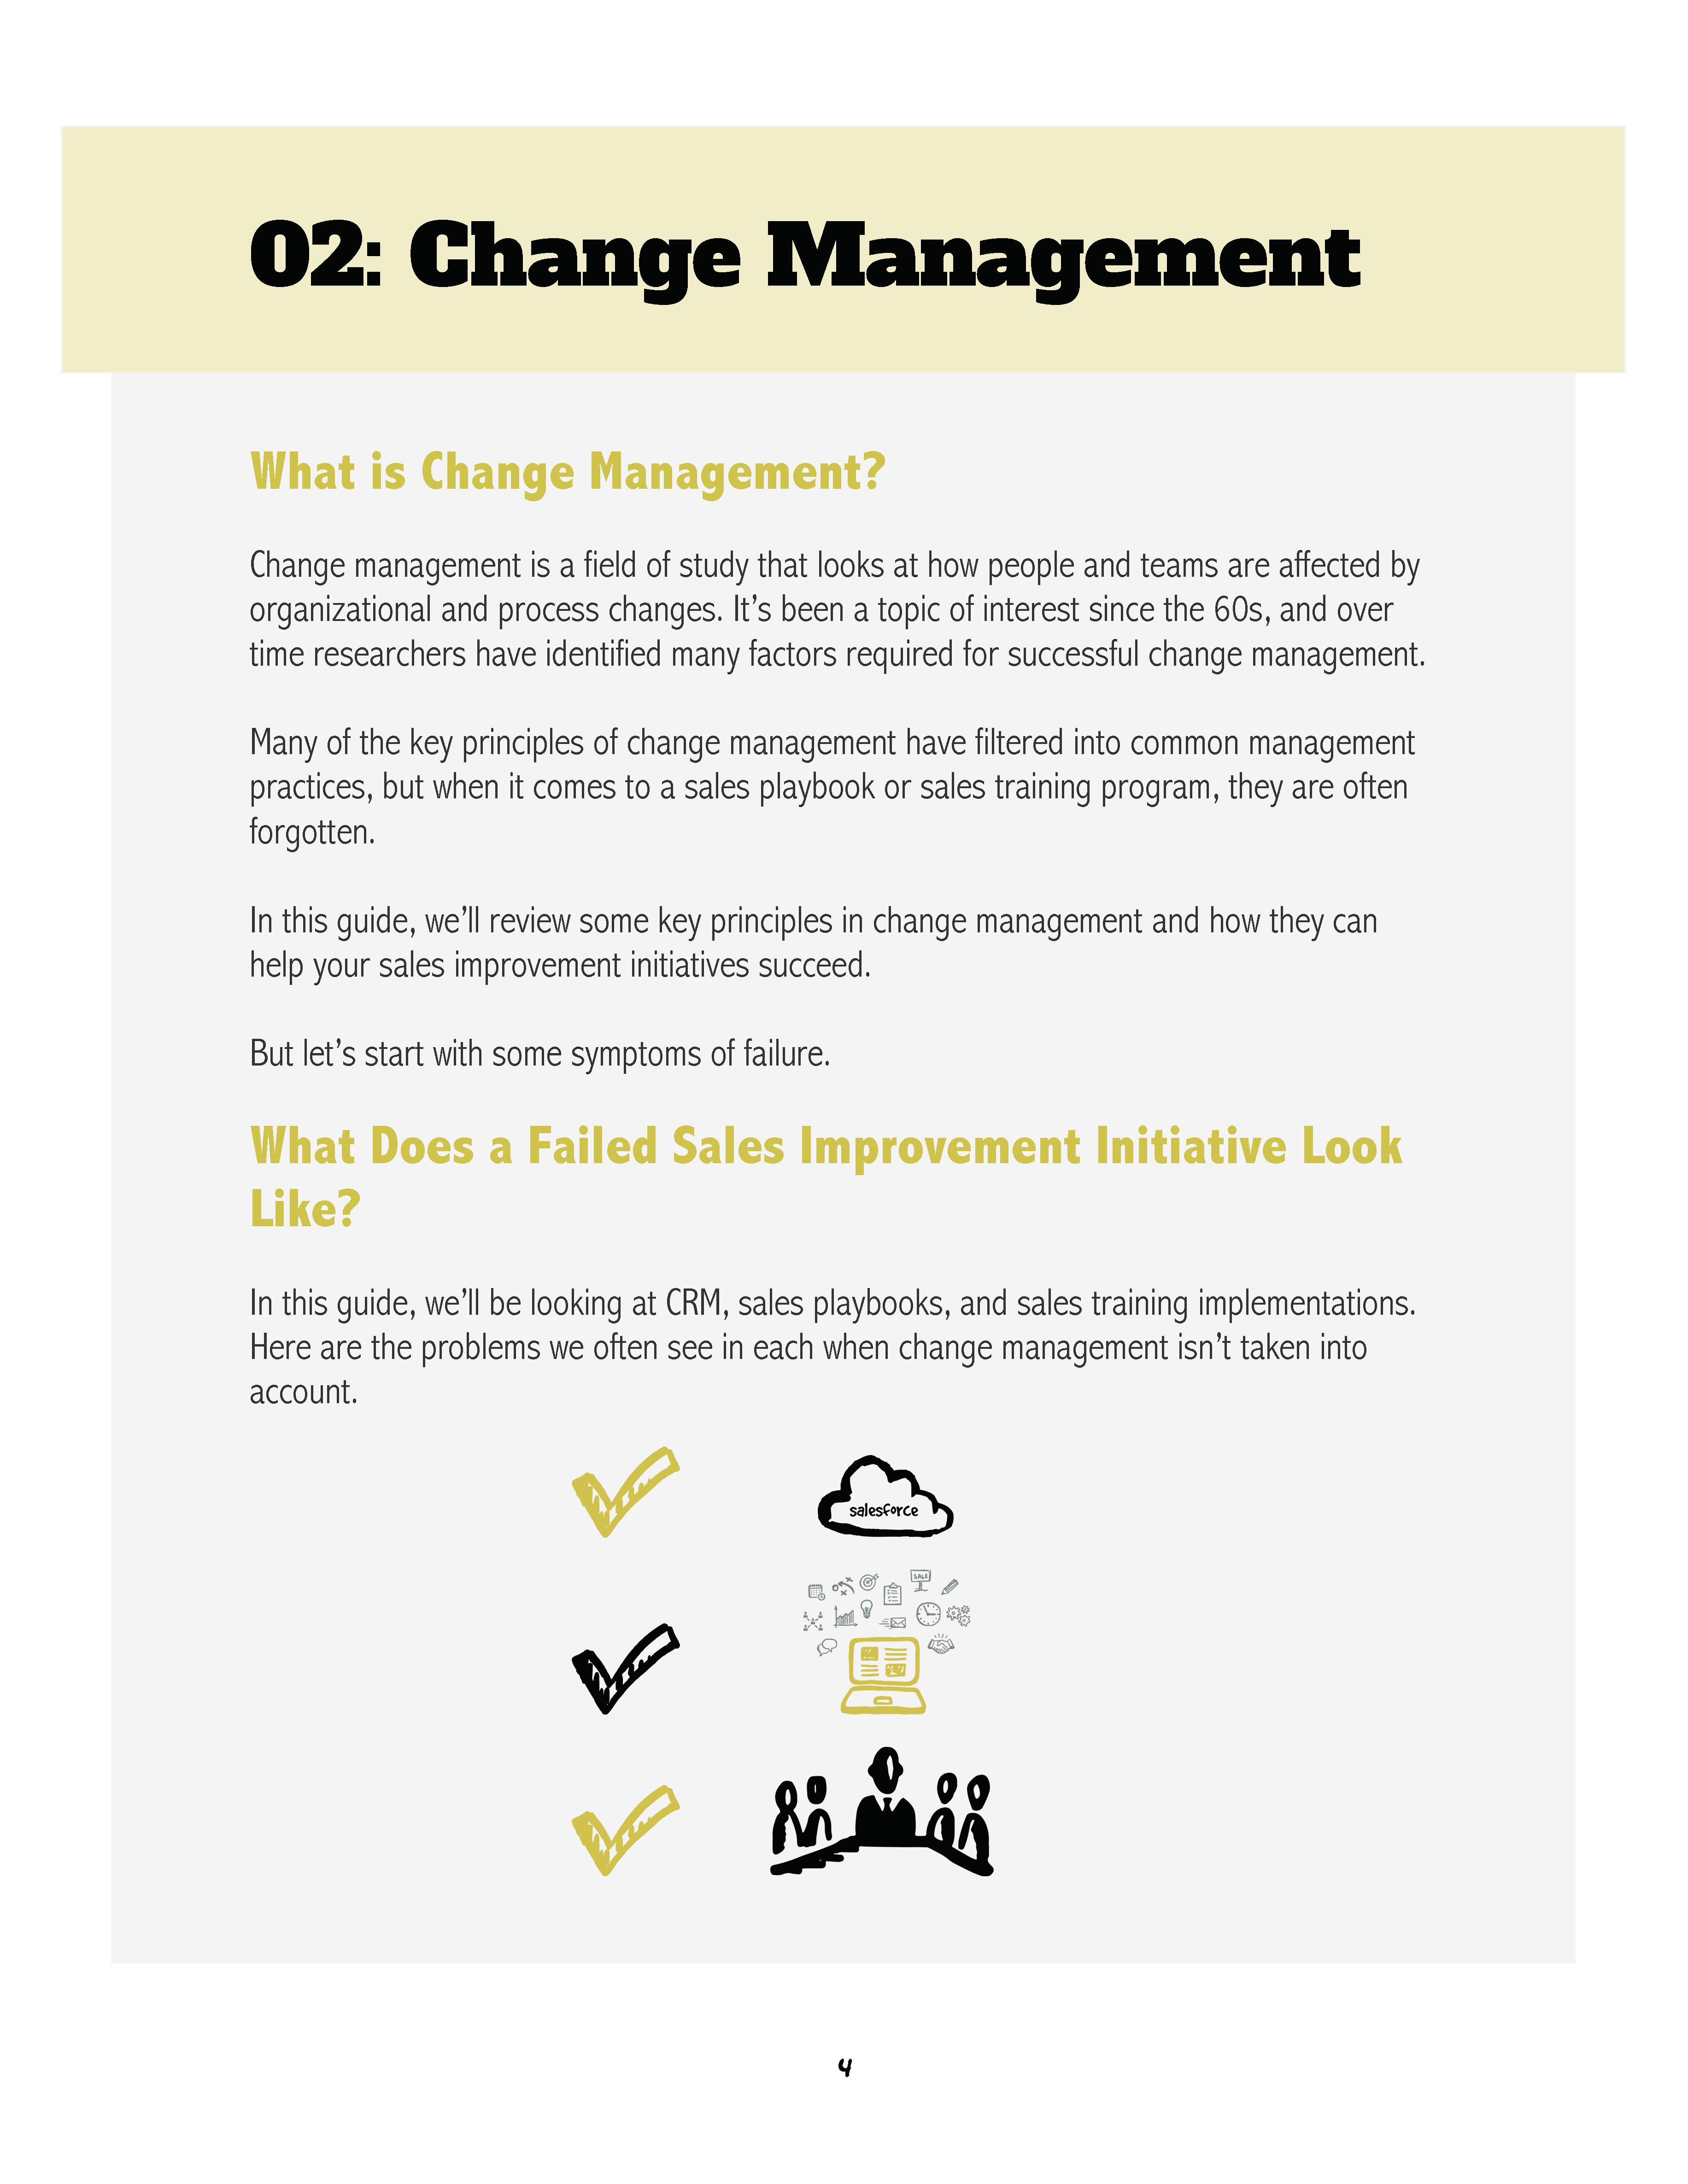 Landing_Page_-_Change_Management_4.png